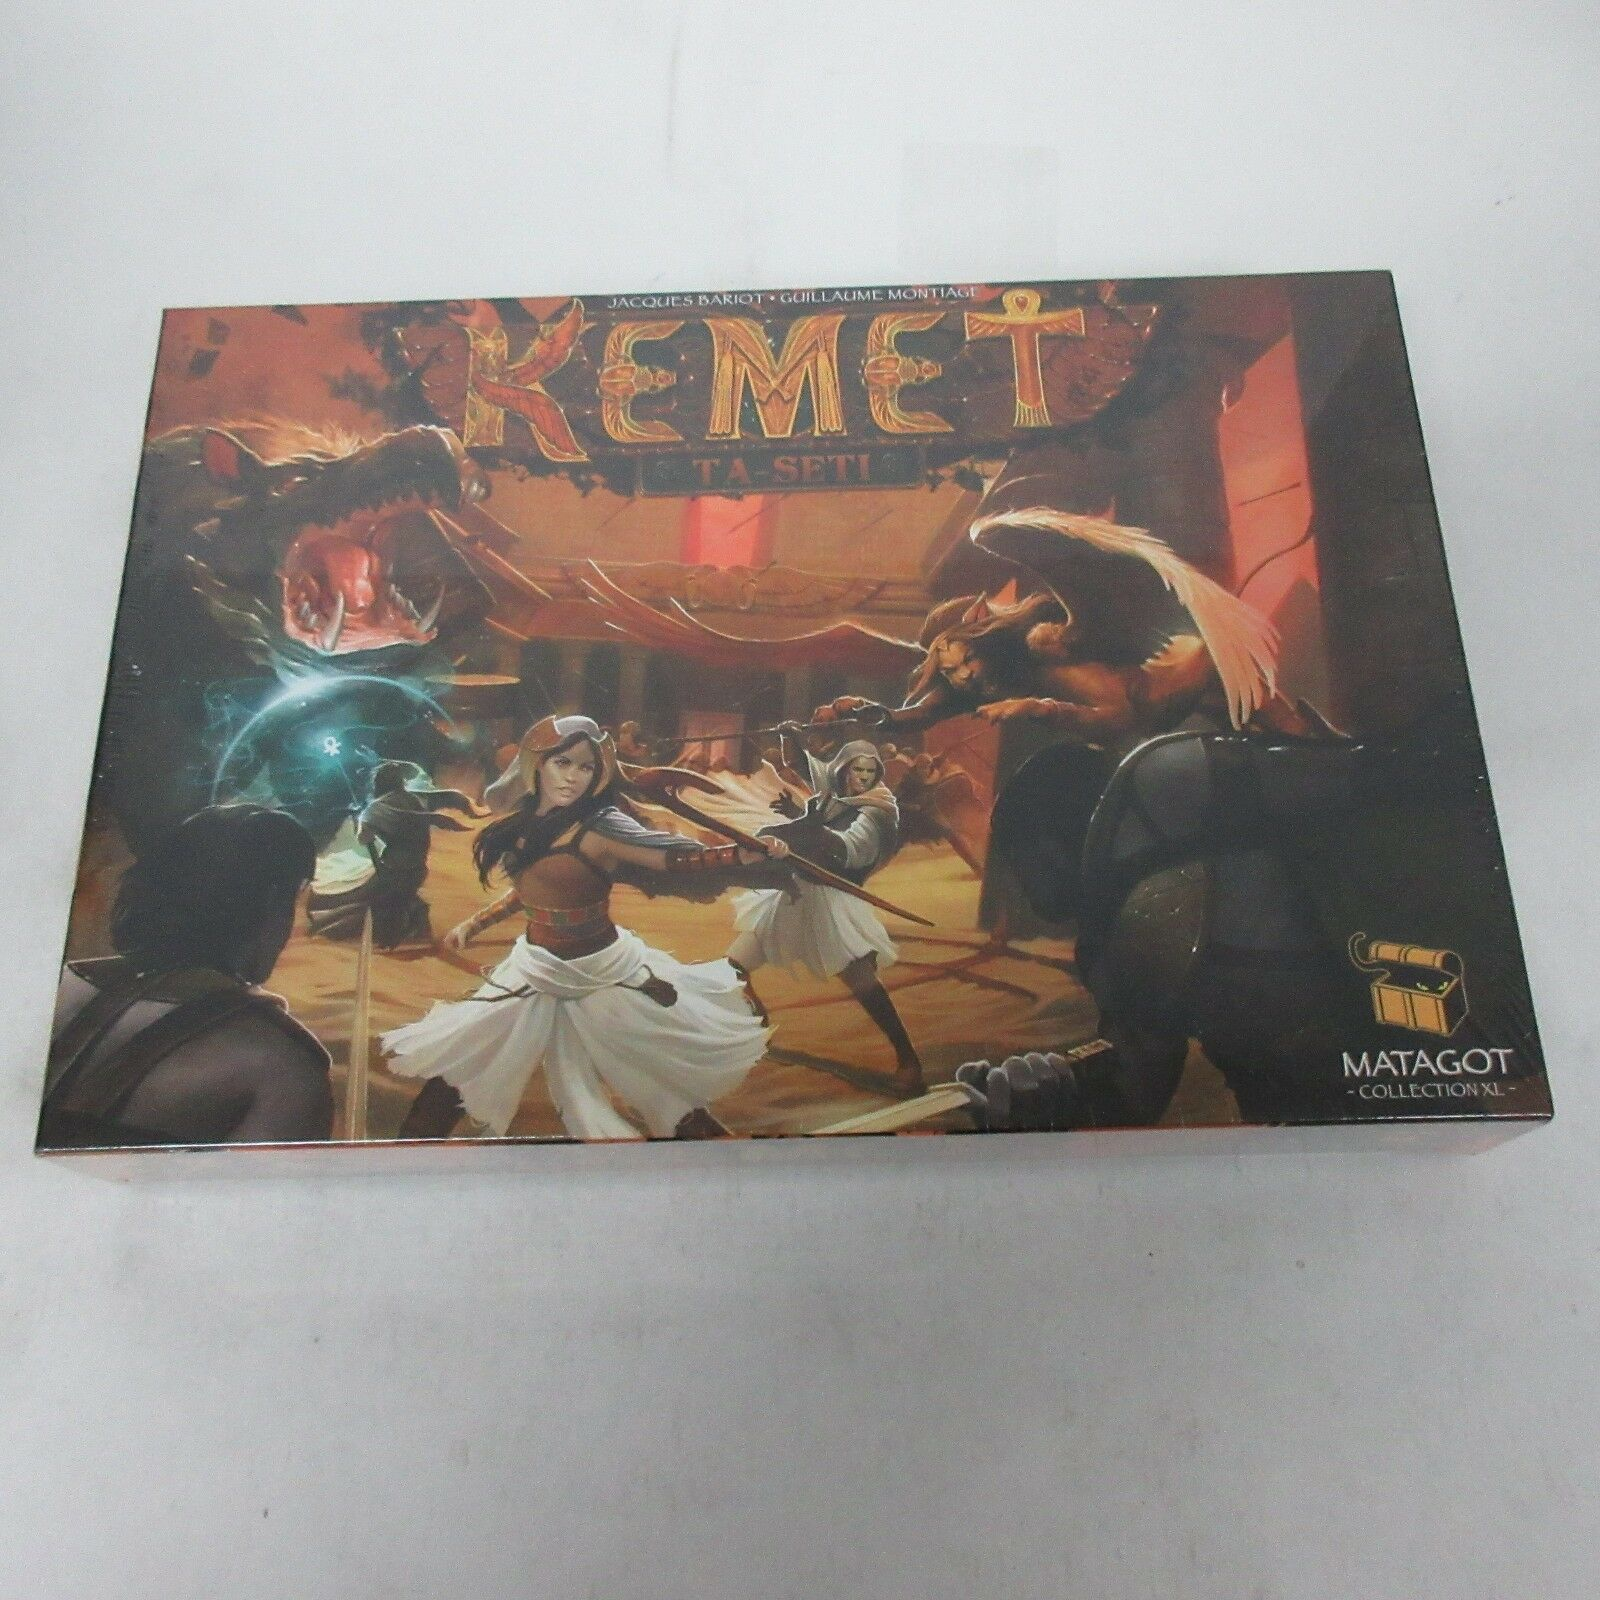 Matagot Kemet   Ta-Seti Expansion tavola gioco nuovo  vendita online sconto prezzo basso